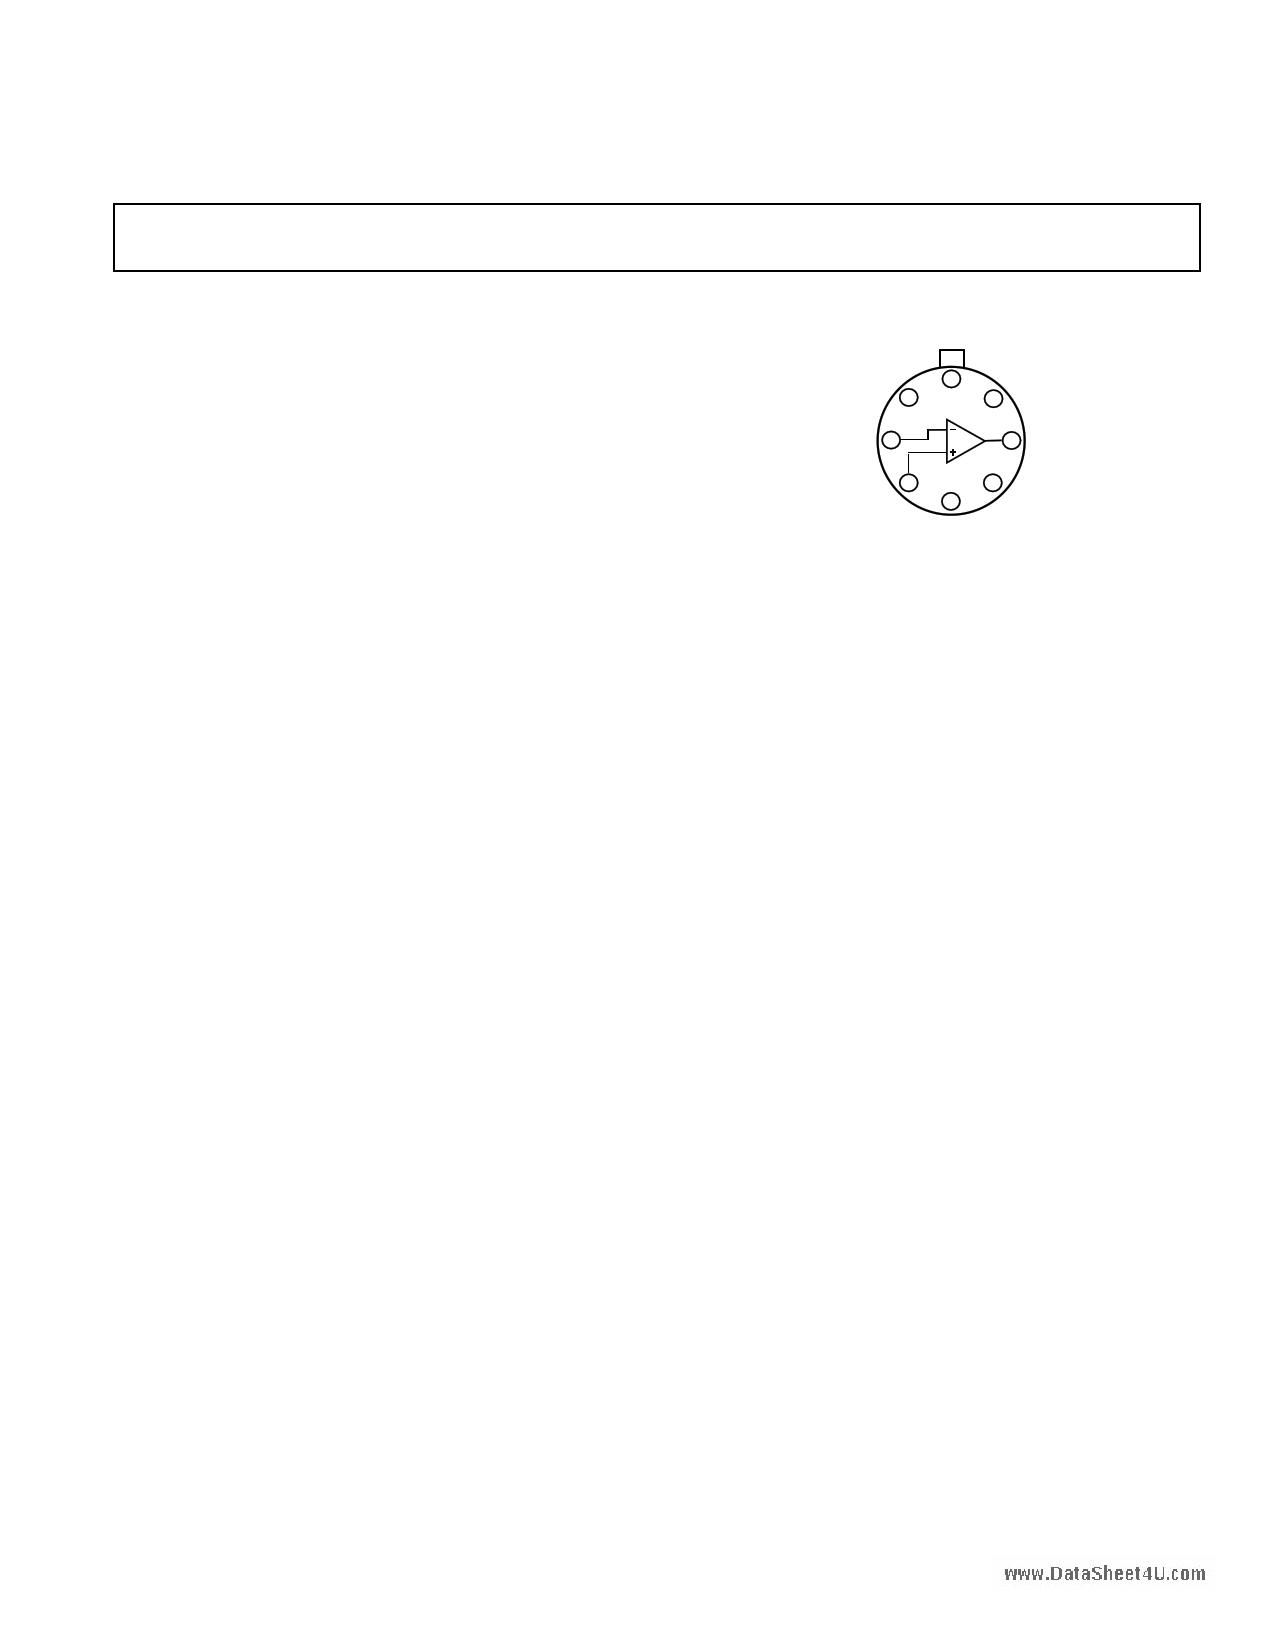 AD542 datasheet